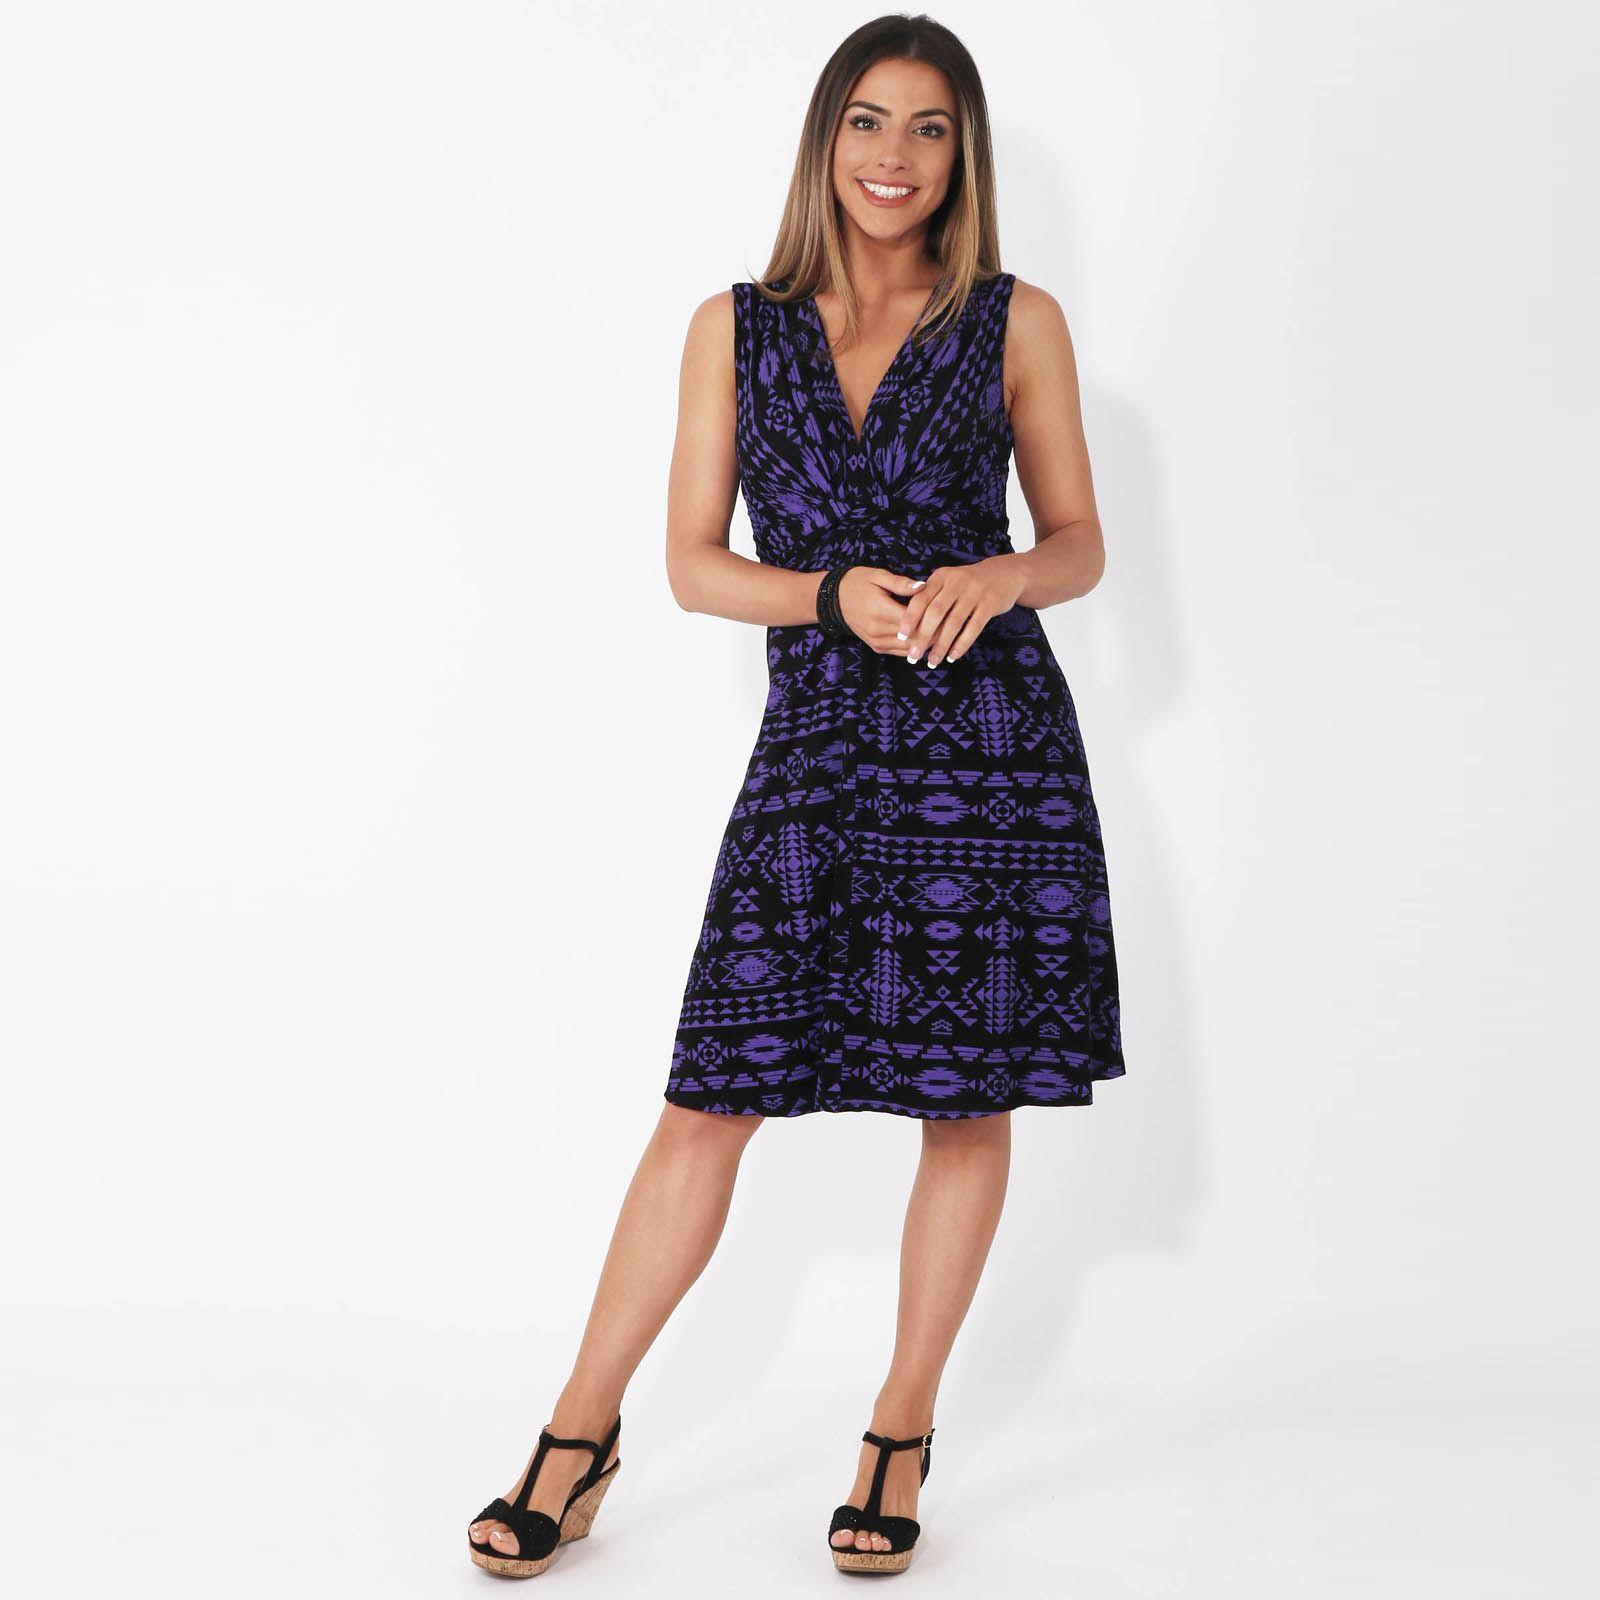 Womens-V-Neck-Mini-Dress-Small-Sizes-Short-Skirt-Tribal-Print-Front-Knot-Party thumbnail 13